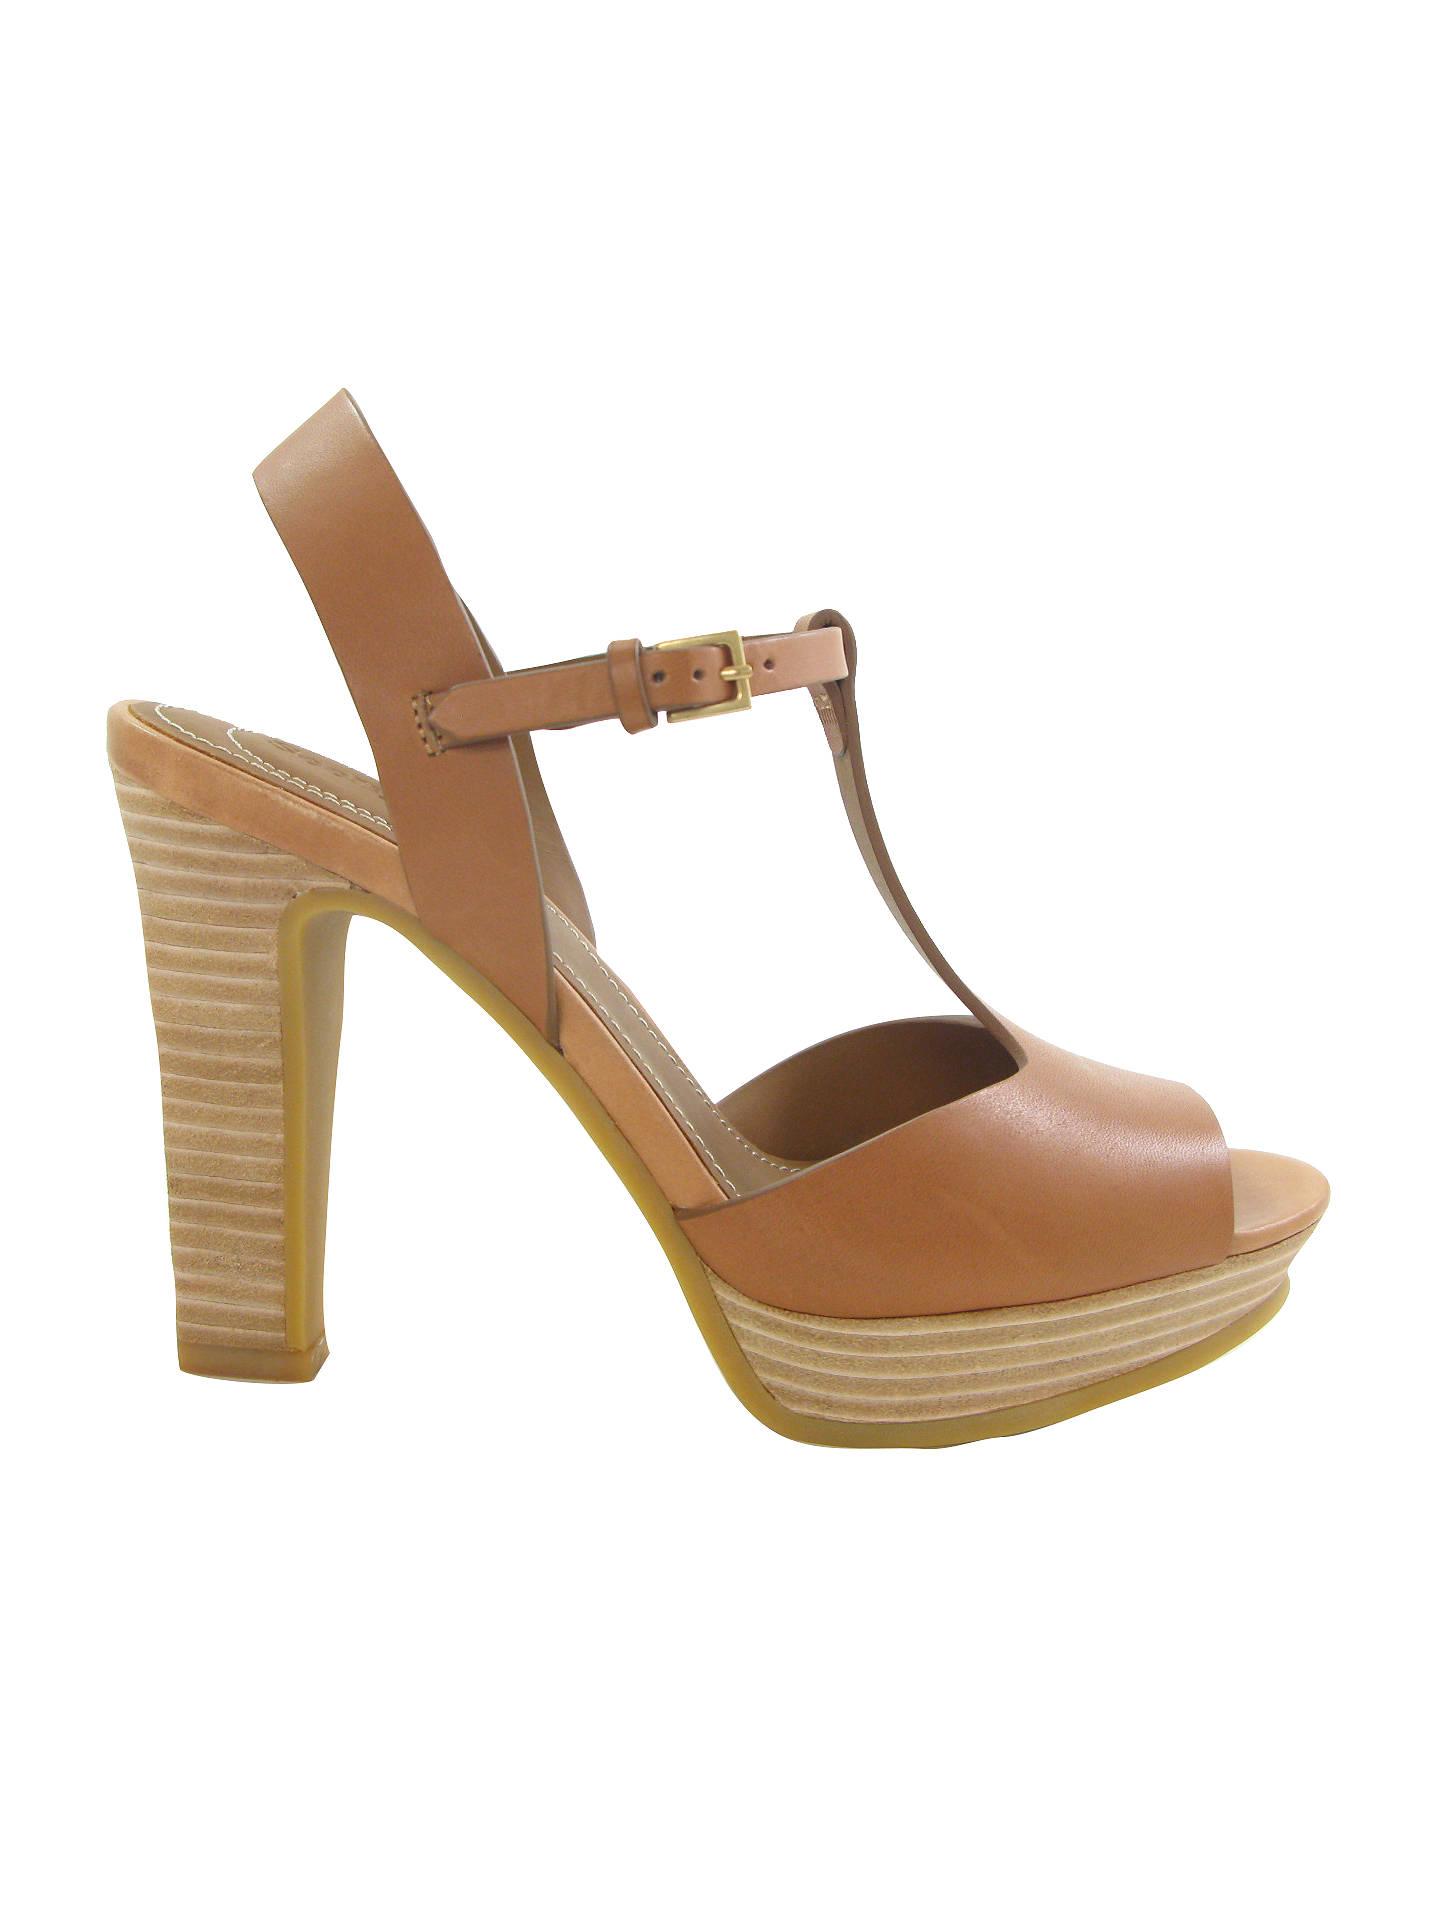 Buy See by Chloé Alex Block Heel T-Bar Sandals